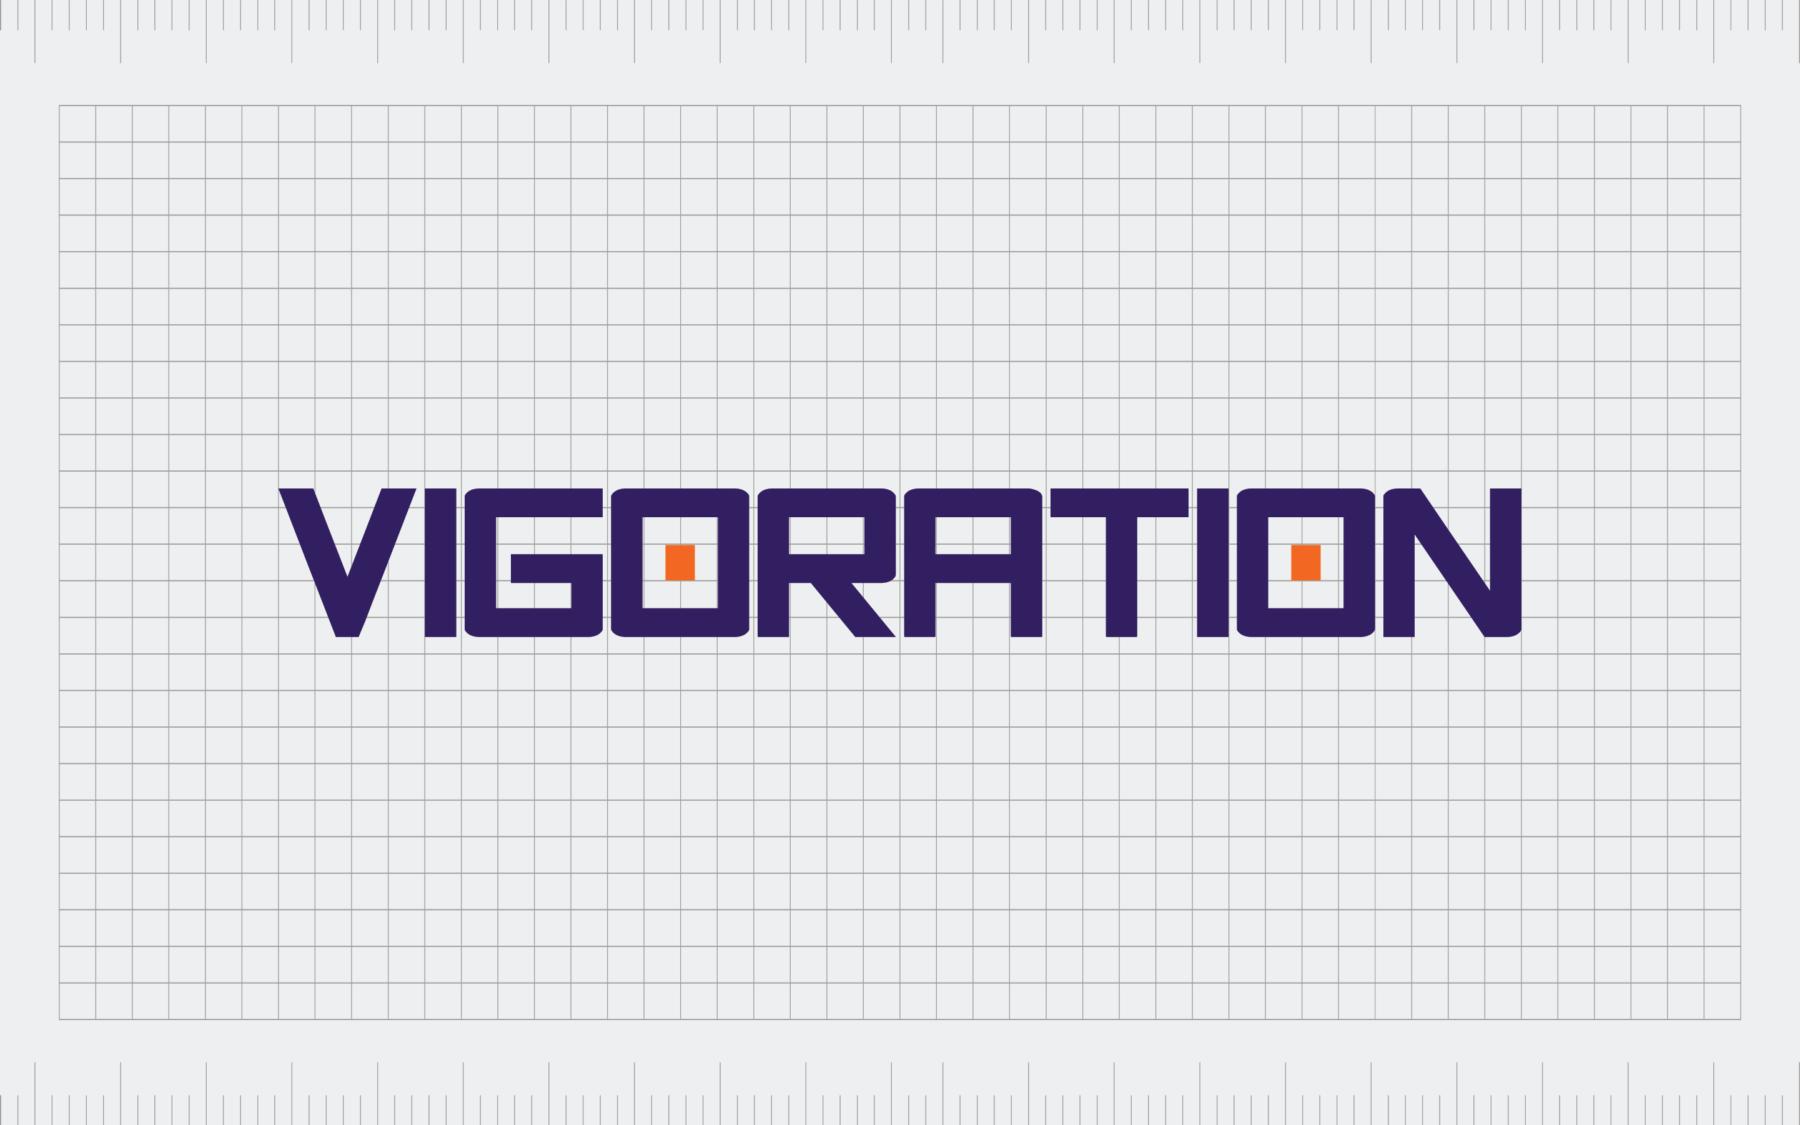 Vigoration